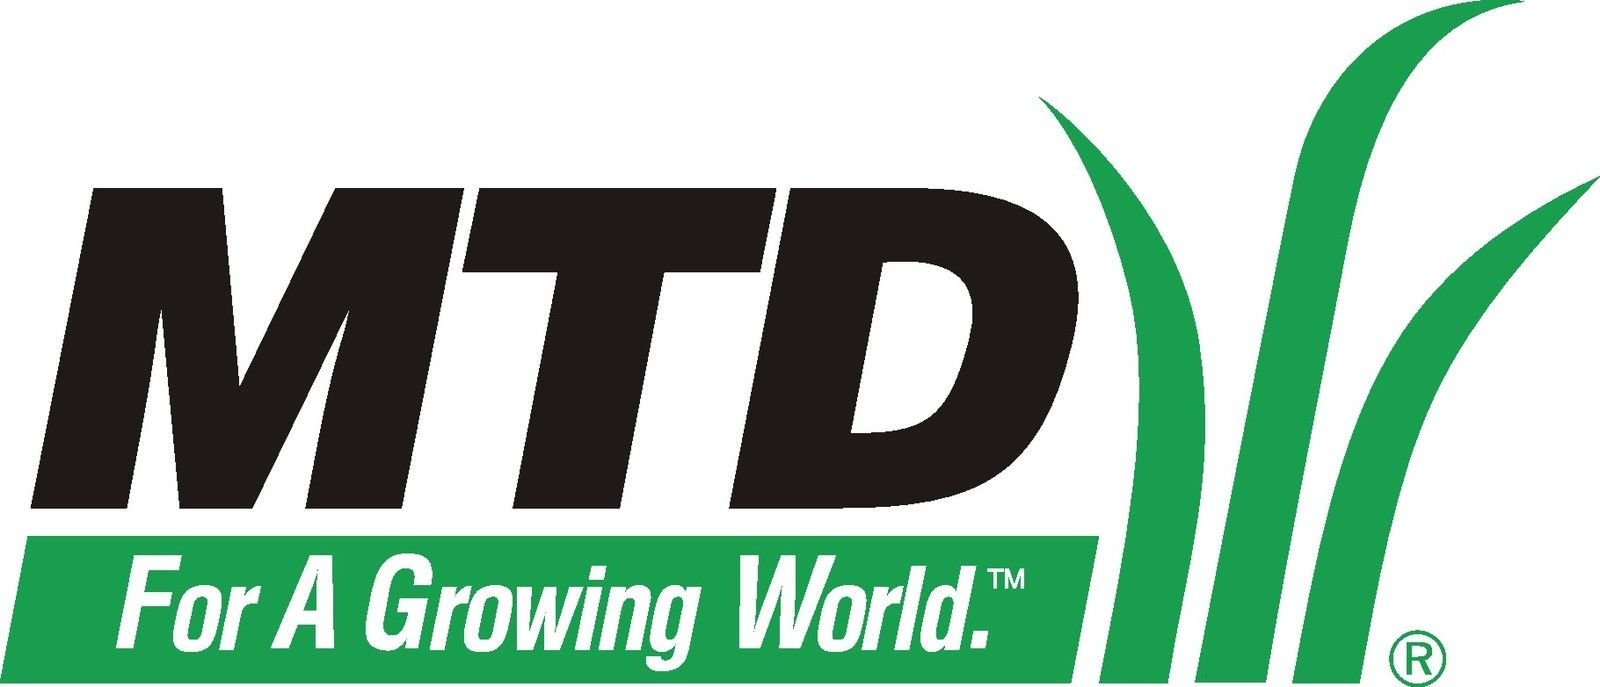 Genuine MTD 718-04706P Log Spltter Control Valve fits Troy Bilt 718-04706 OEM ;from#atlantic_tool_warehouse